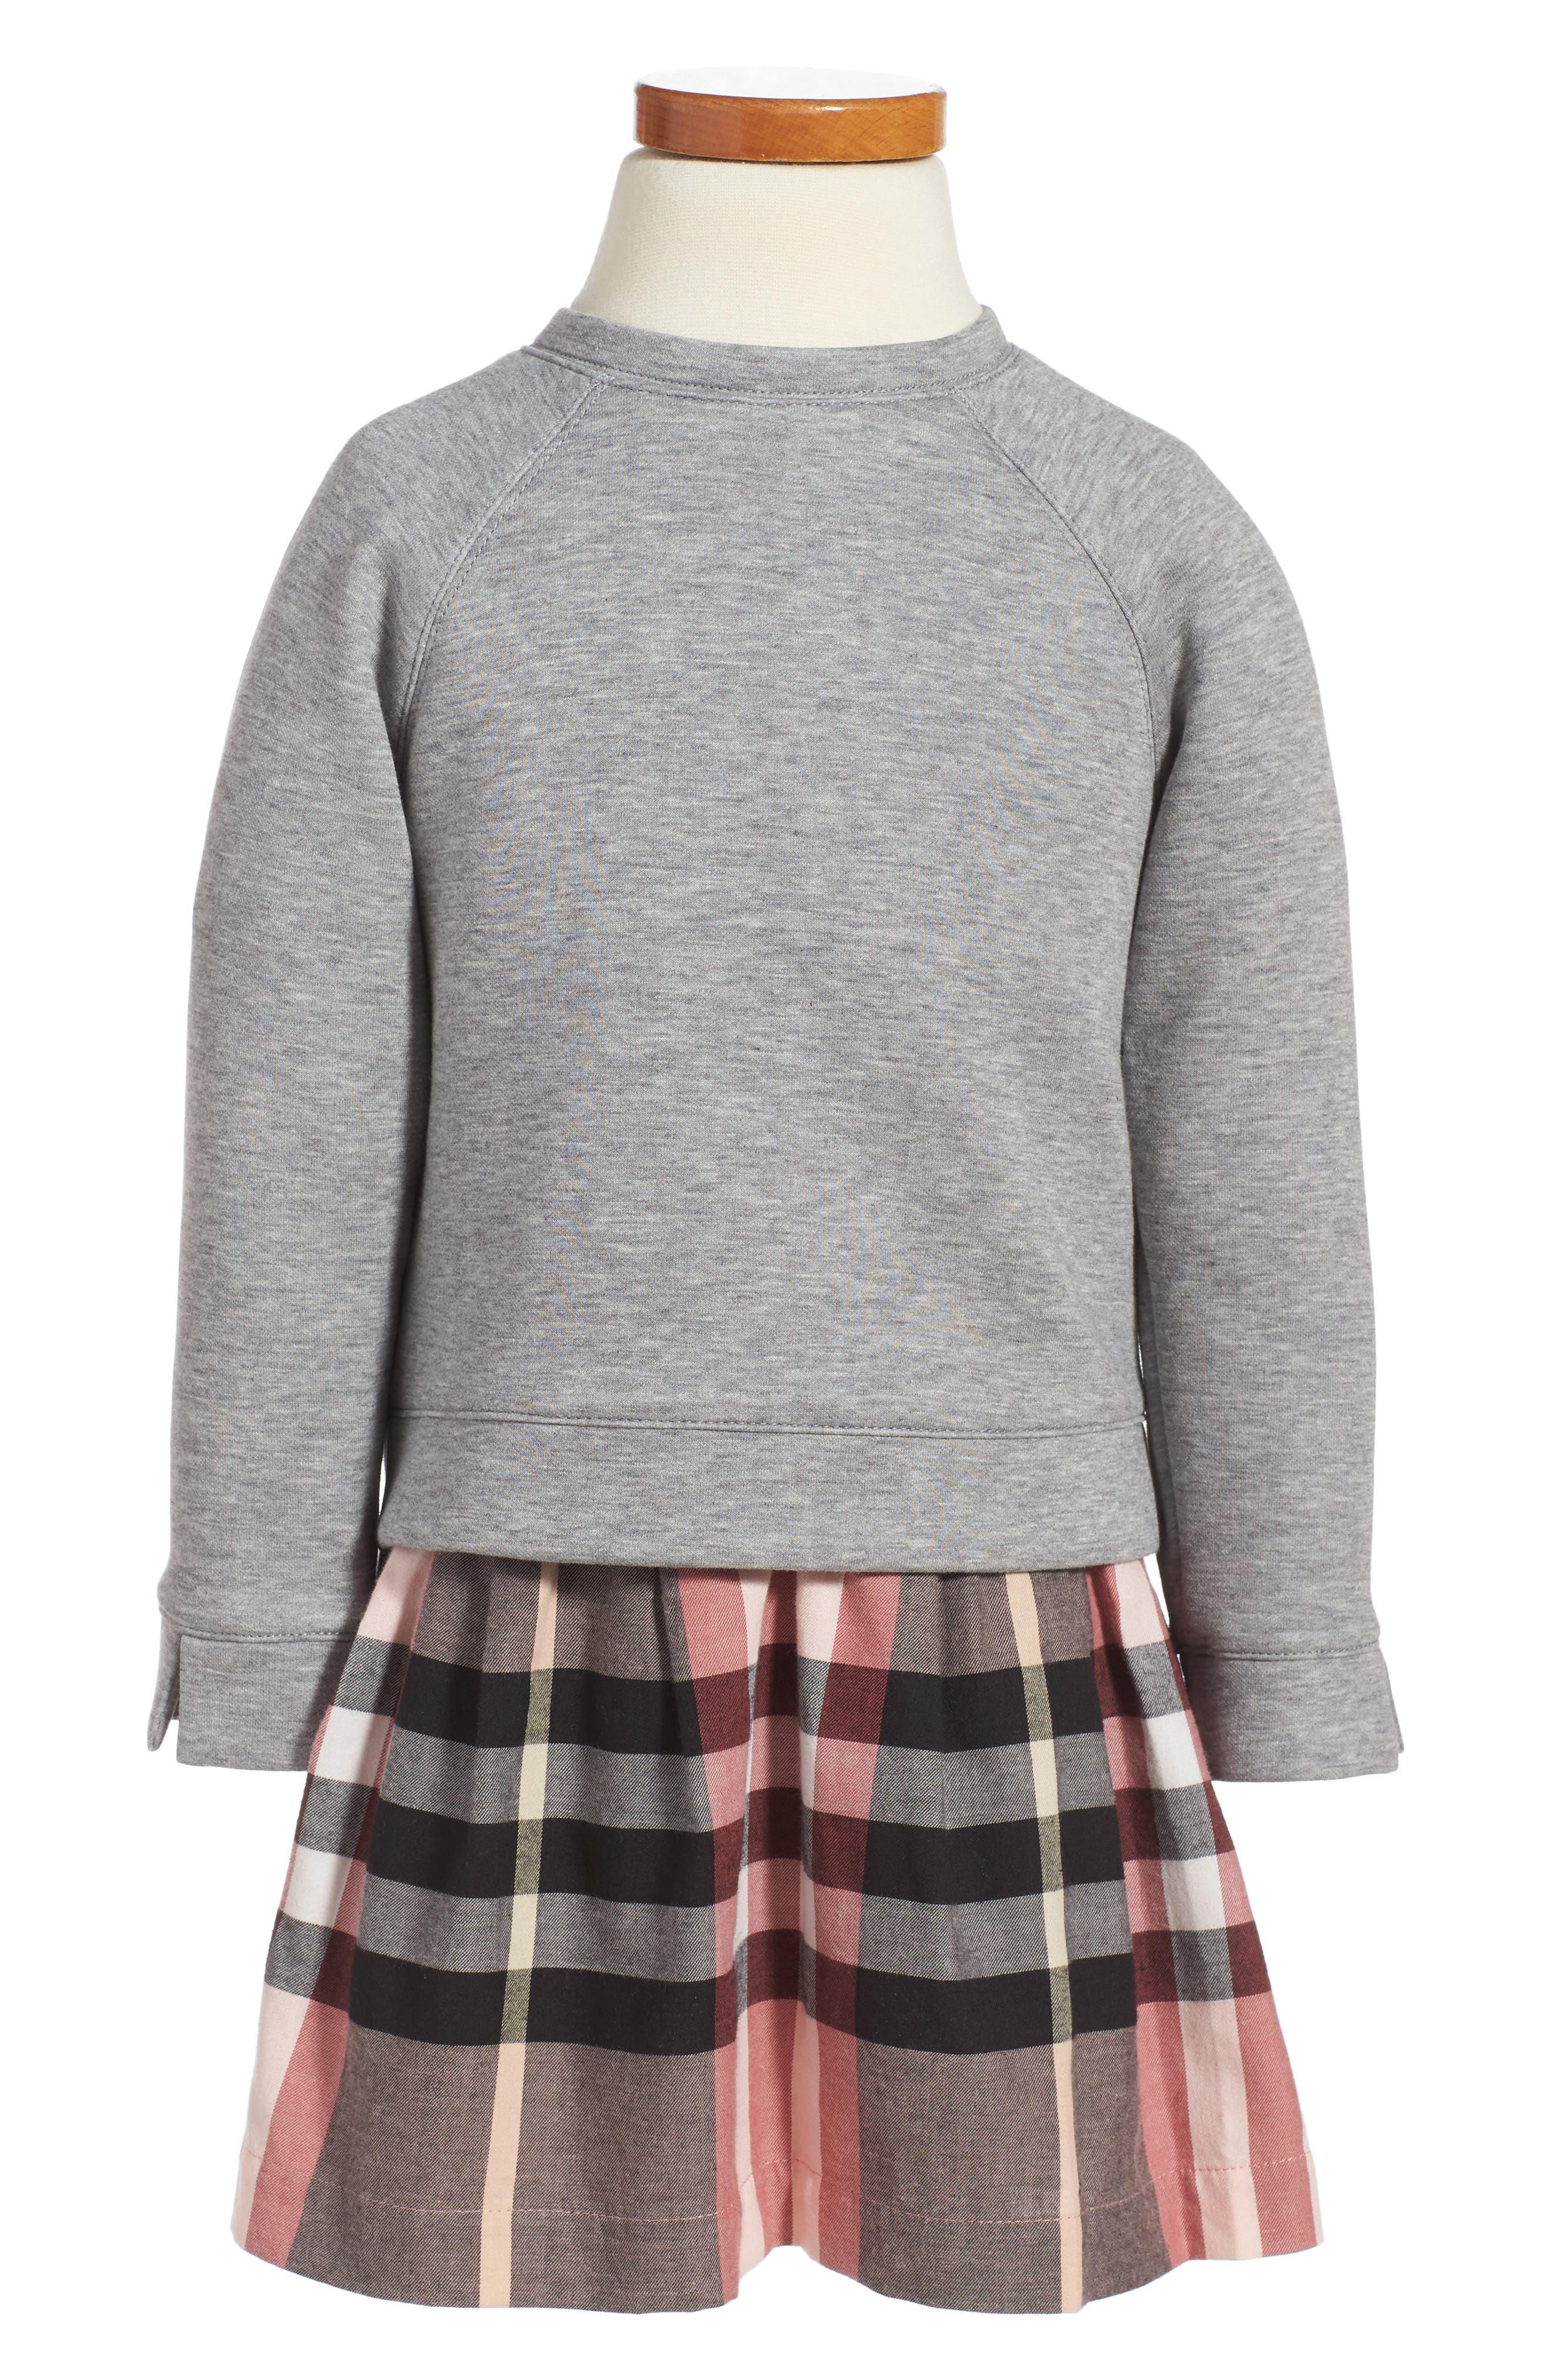 Burberry Mini Francine Sweatshirt Dress (Toddler Girls)